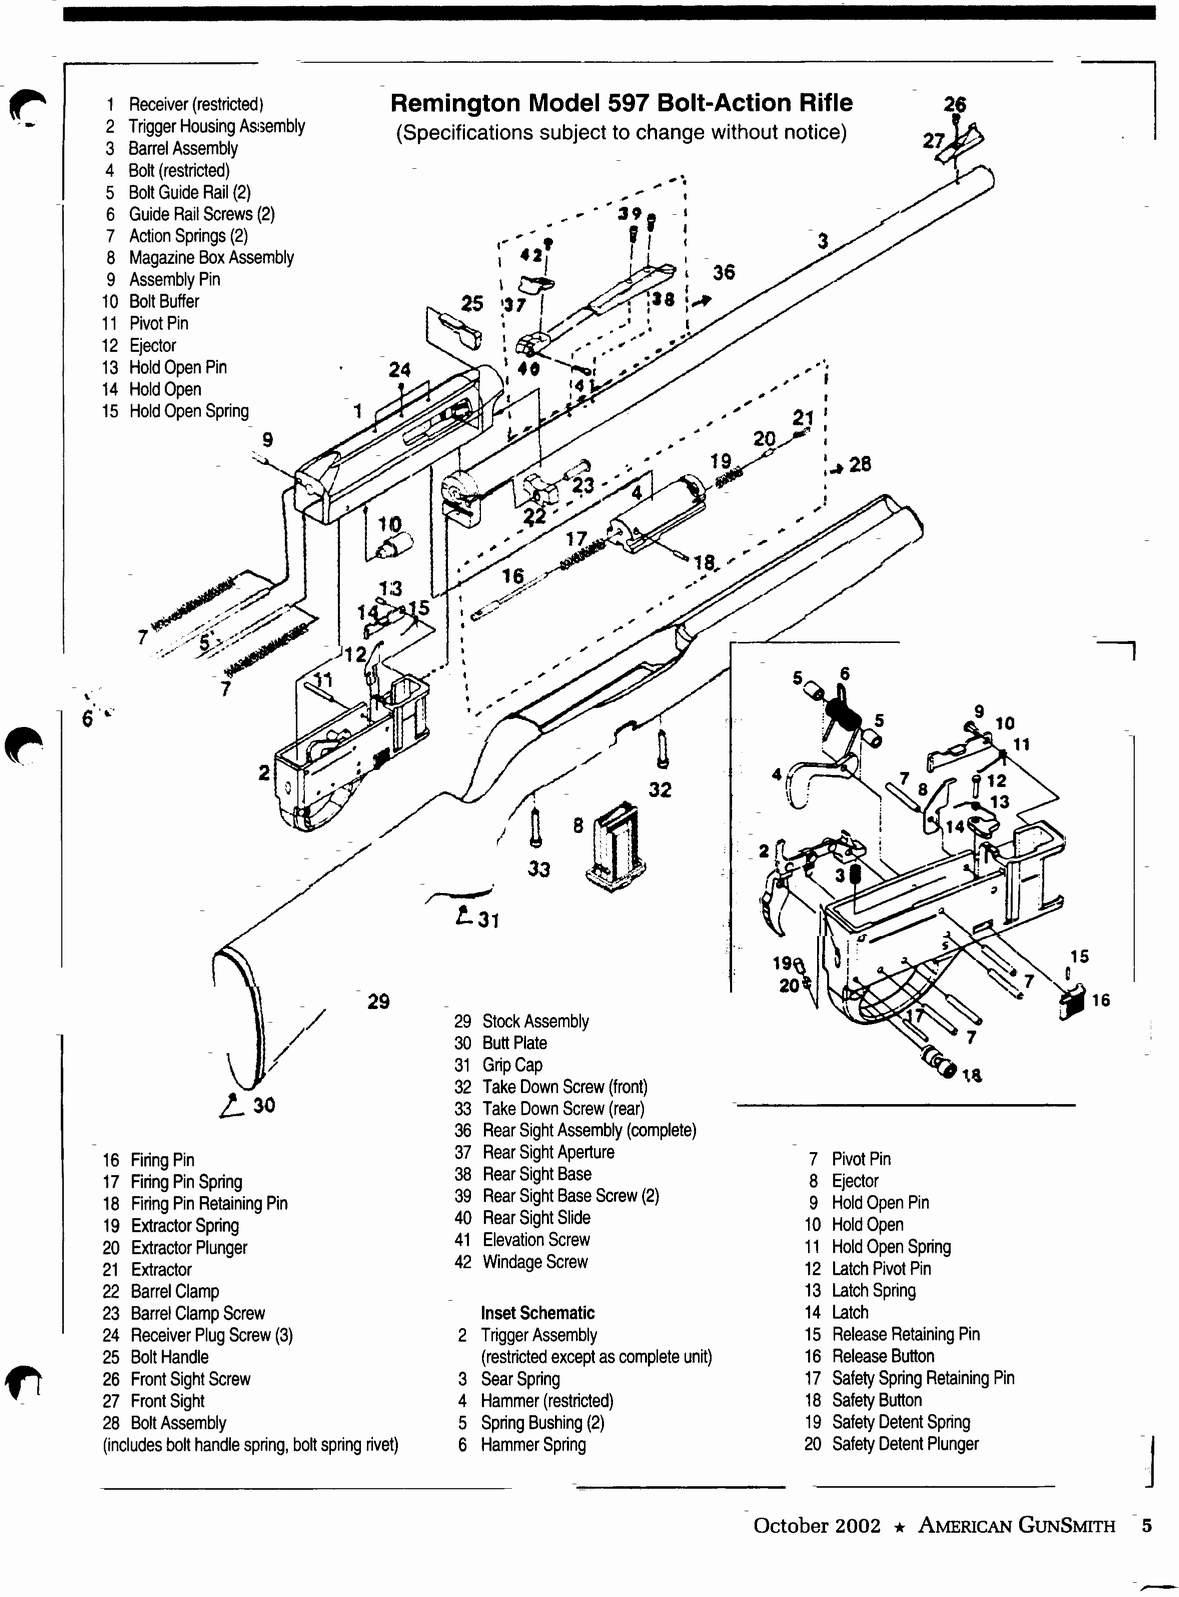 [TH_6546] Ring Main Circuit Diagram Get Domain Pictures